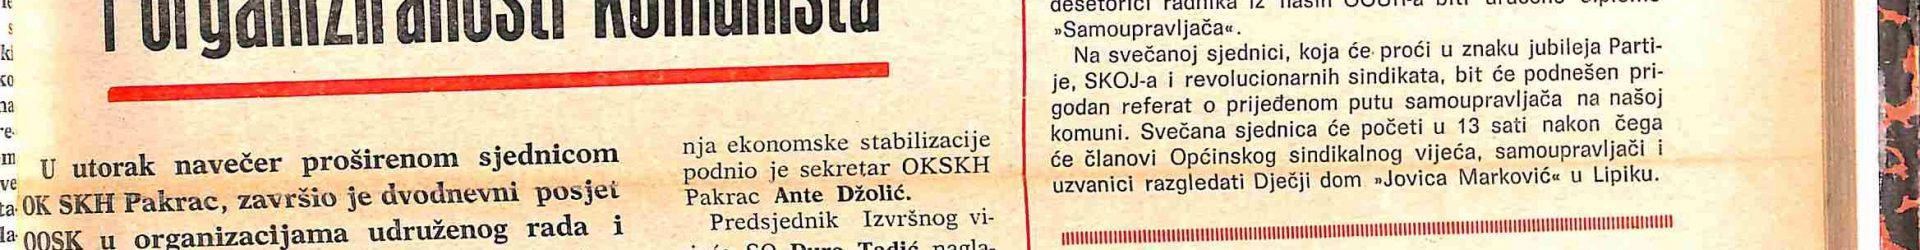 18. lipnja 1979